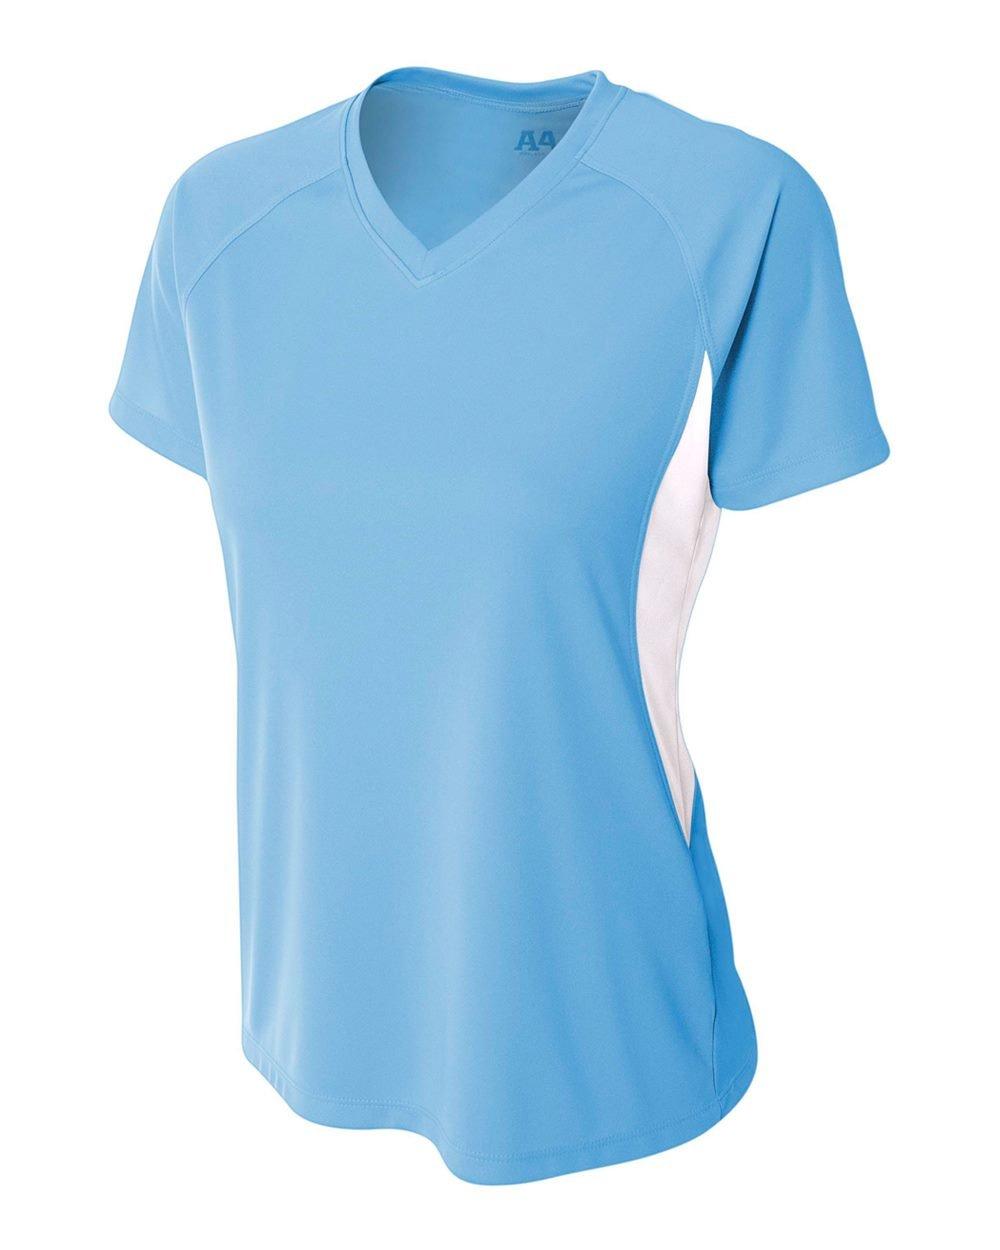 Women 's Athletic Moisture Wicking Vネック2色パフォーマンスシャツ/ Uniform (すべてのスポーツ:サッカー、ソフトボール、バレーボール。。。) B00SW5E03S Large|Light Blue (White Contrast Side Block) Light Blue (White Contrast Side Block) Large